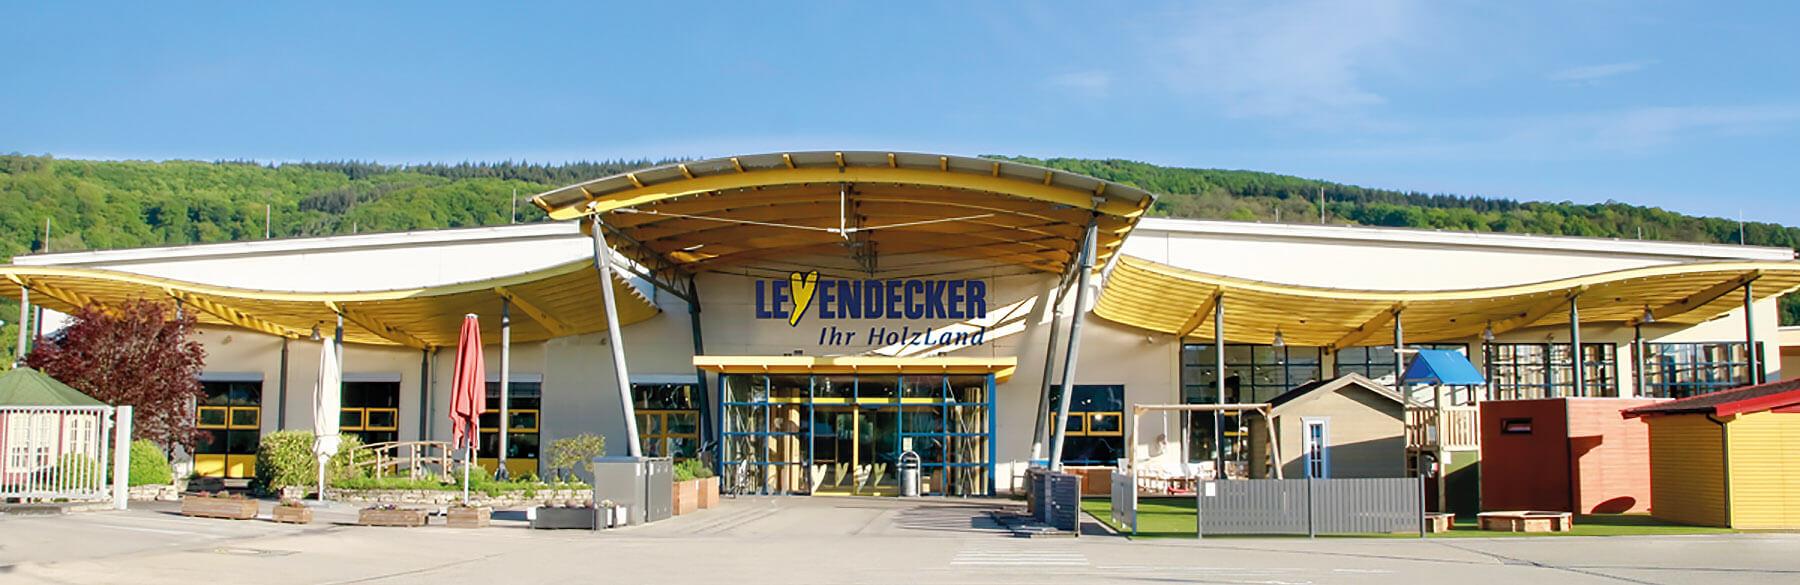 Leyendecker Holzland in Trier